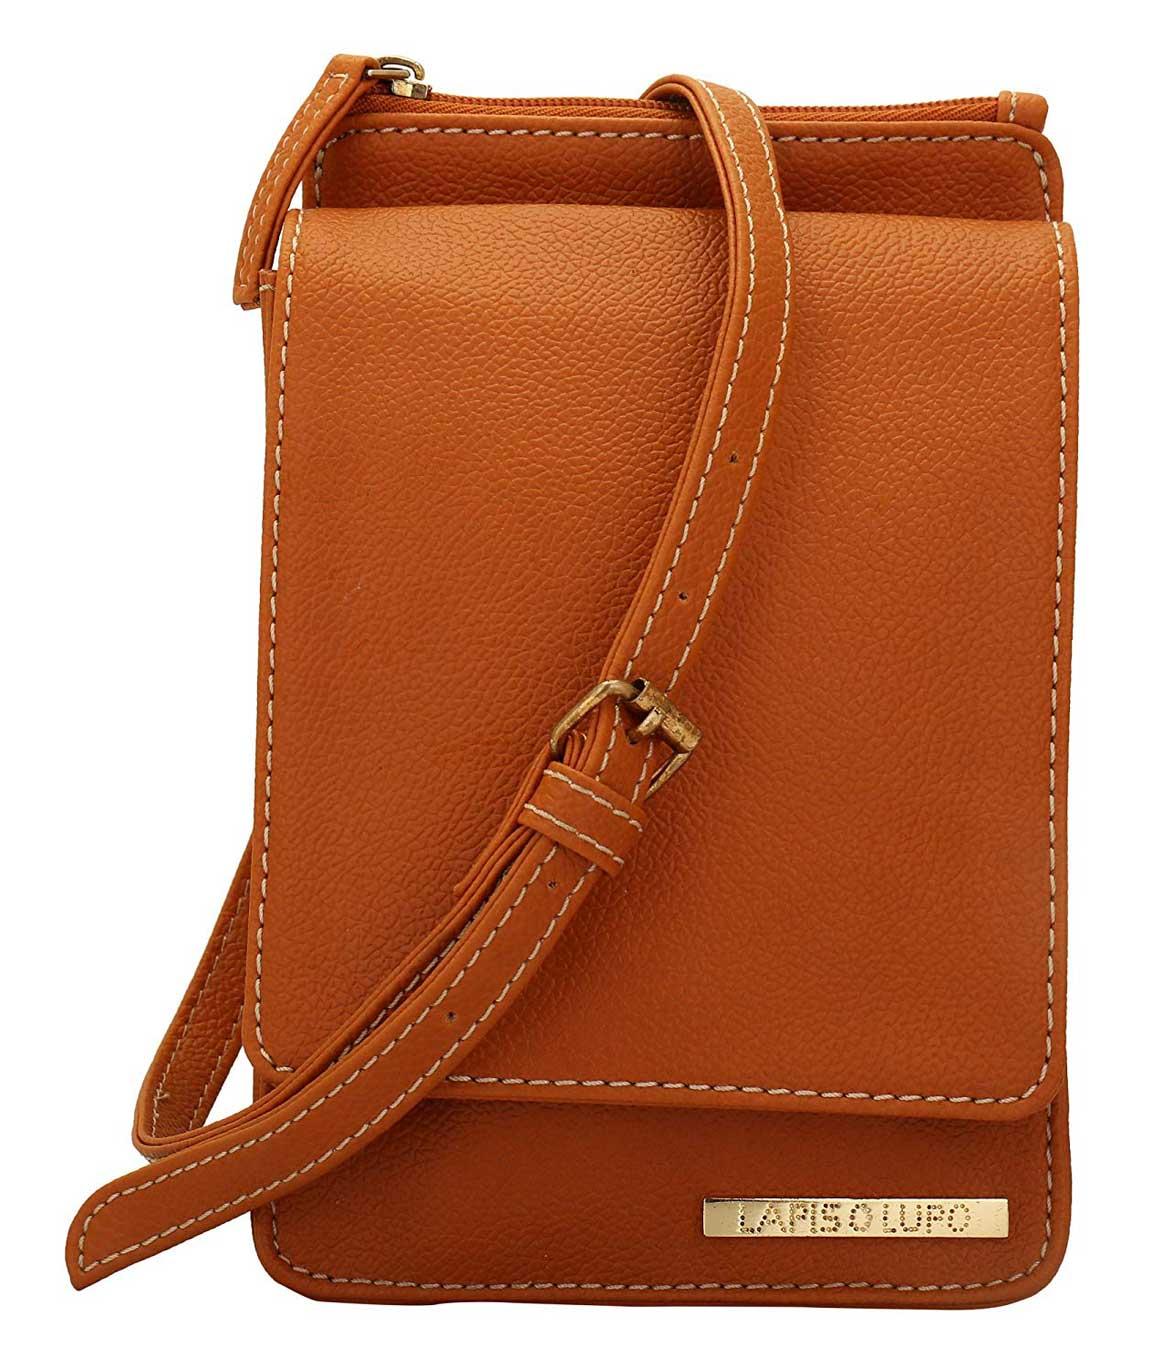 Lapis O Lupo Women`s Sling Bag (Tan, LLSL0019TN)